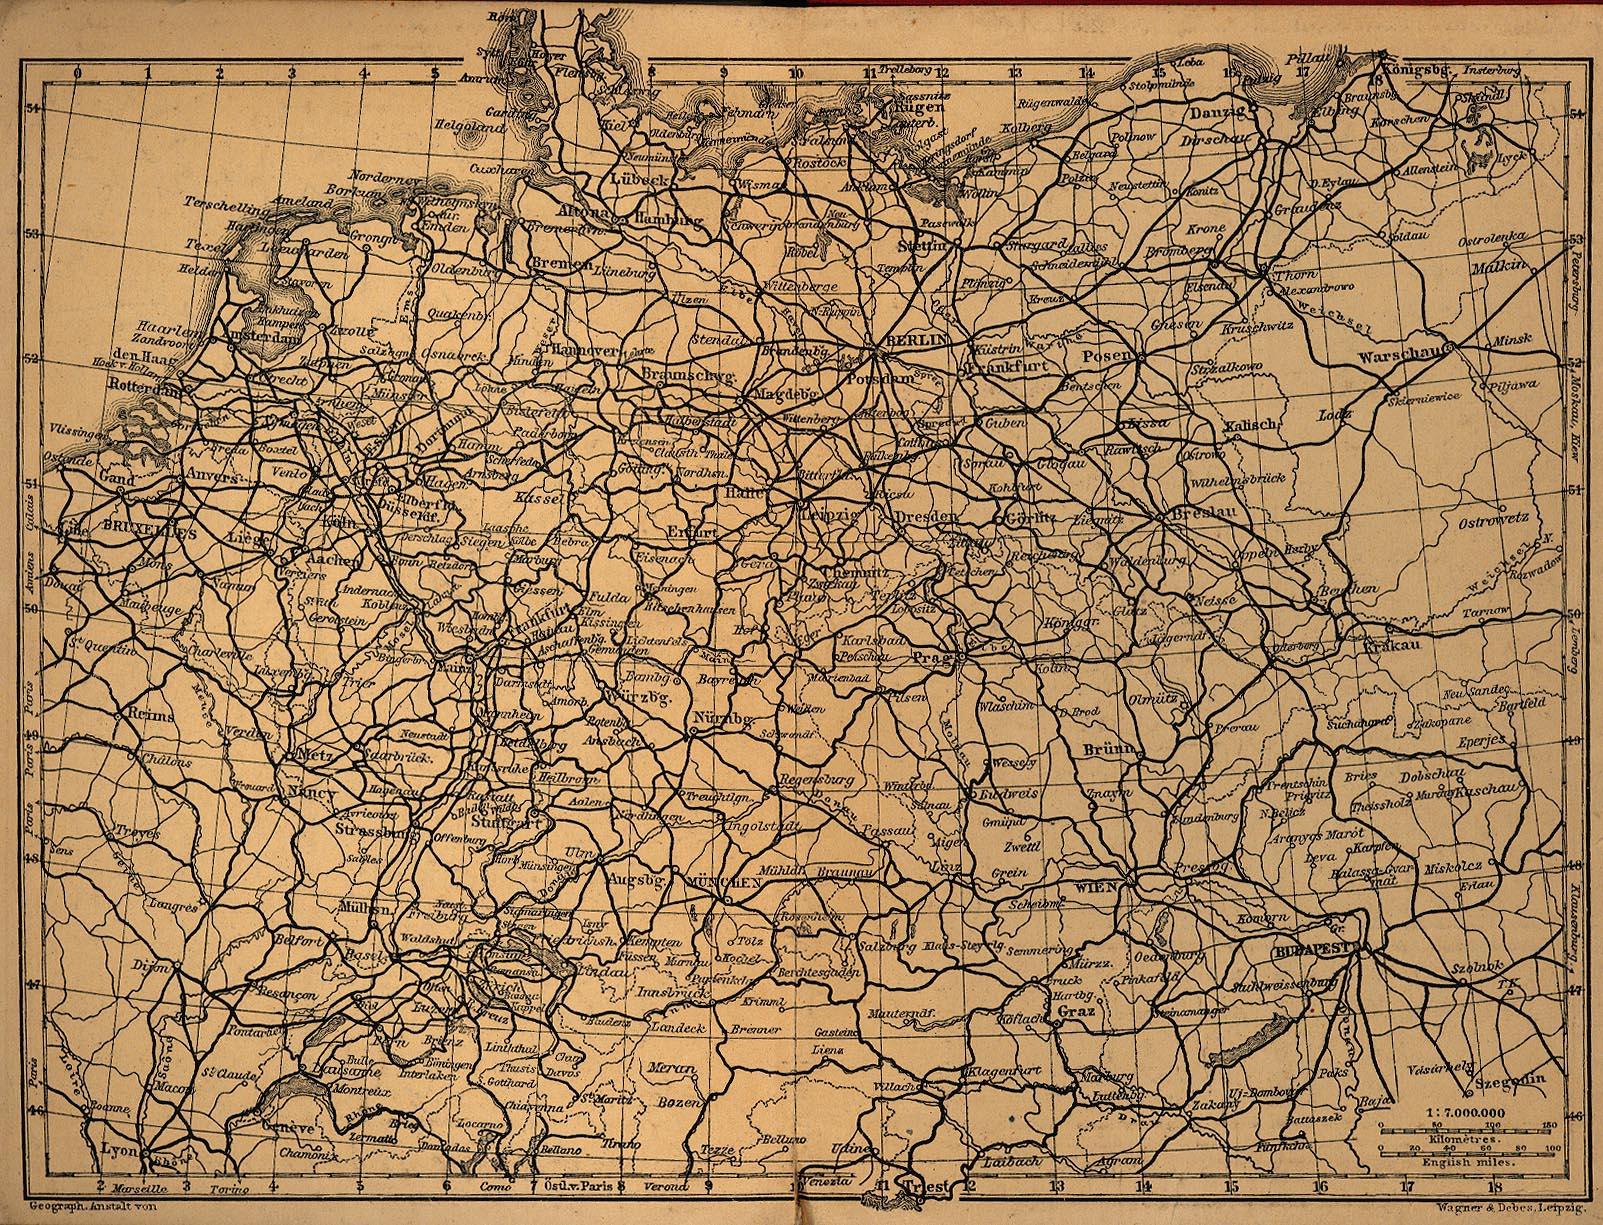 Mapa Ferroviario de Alemania 1910